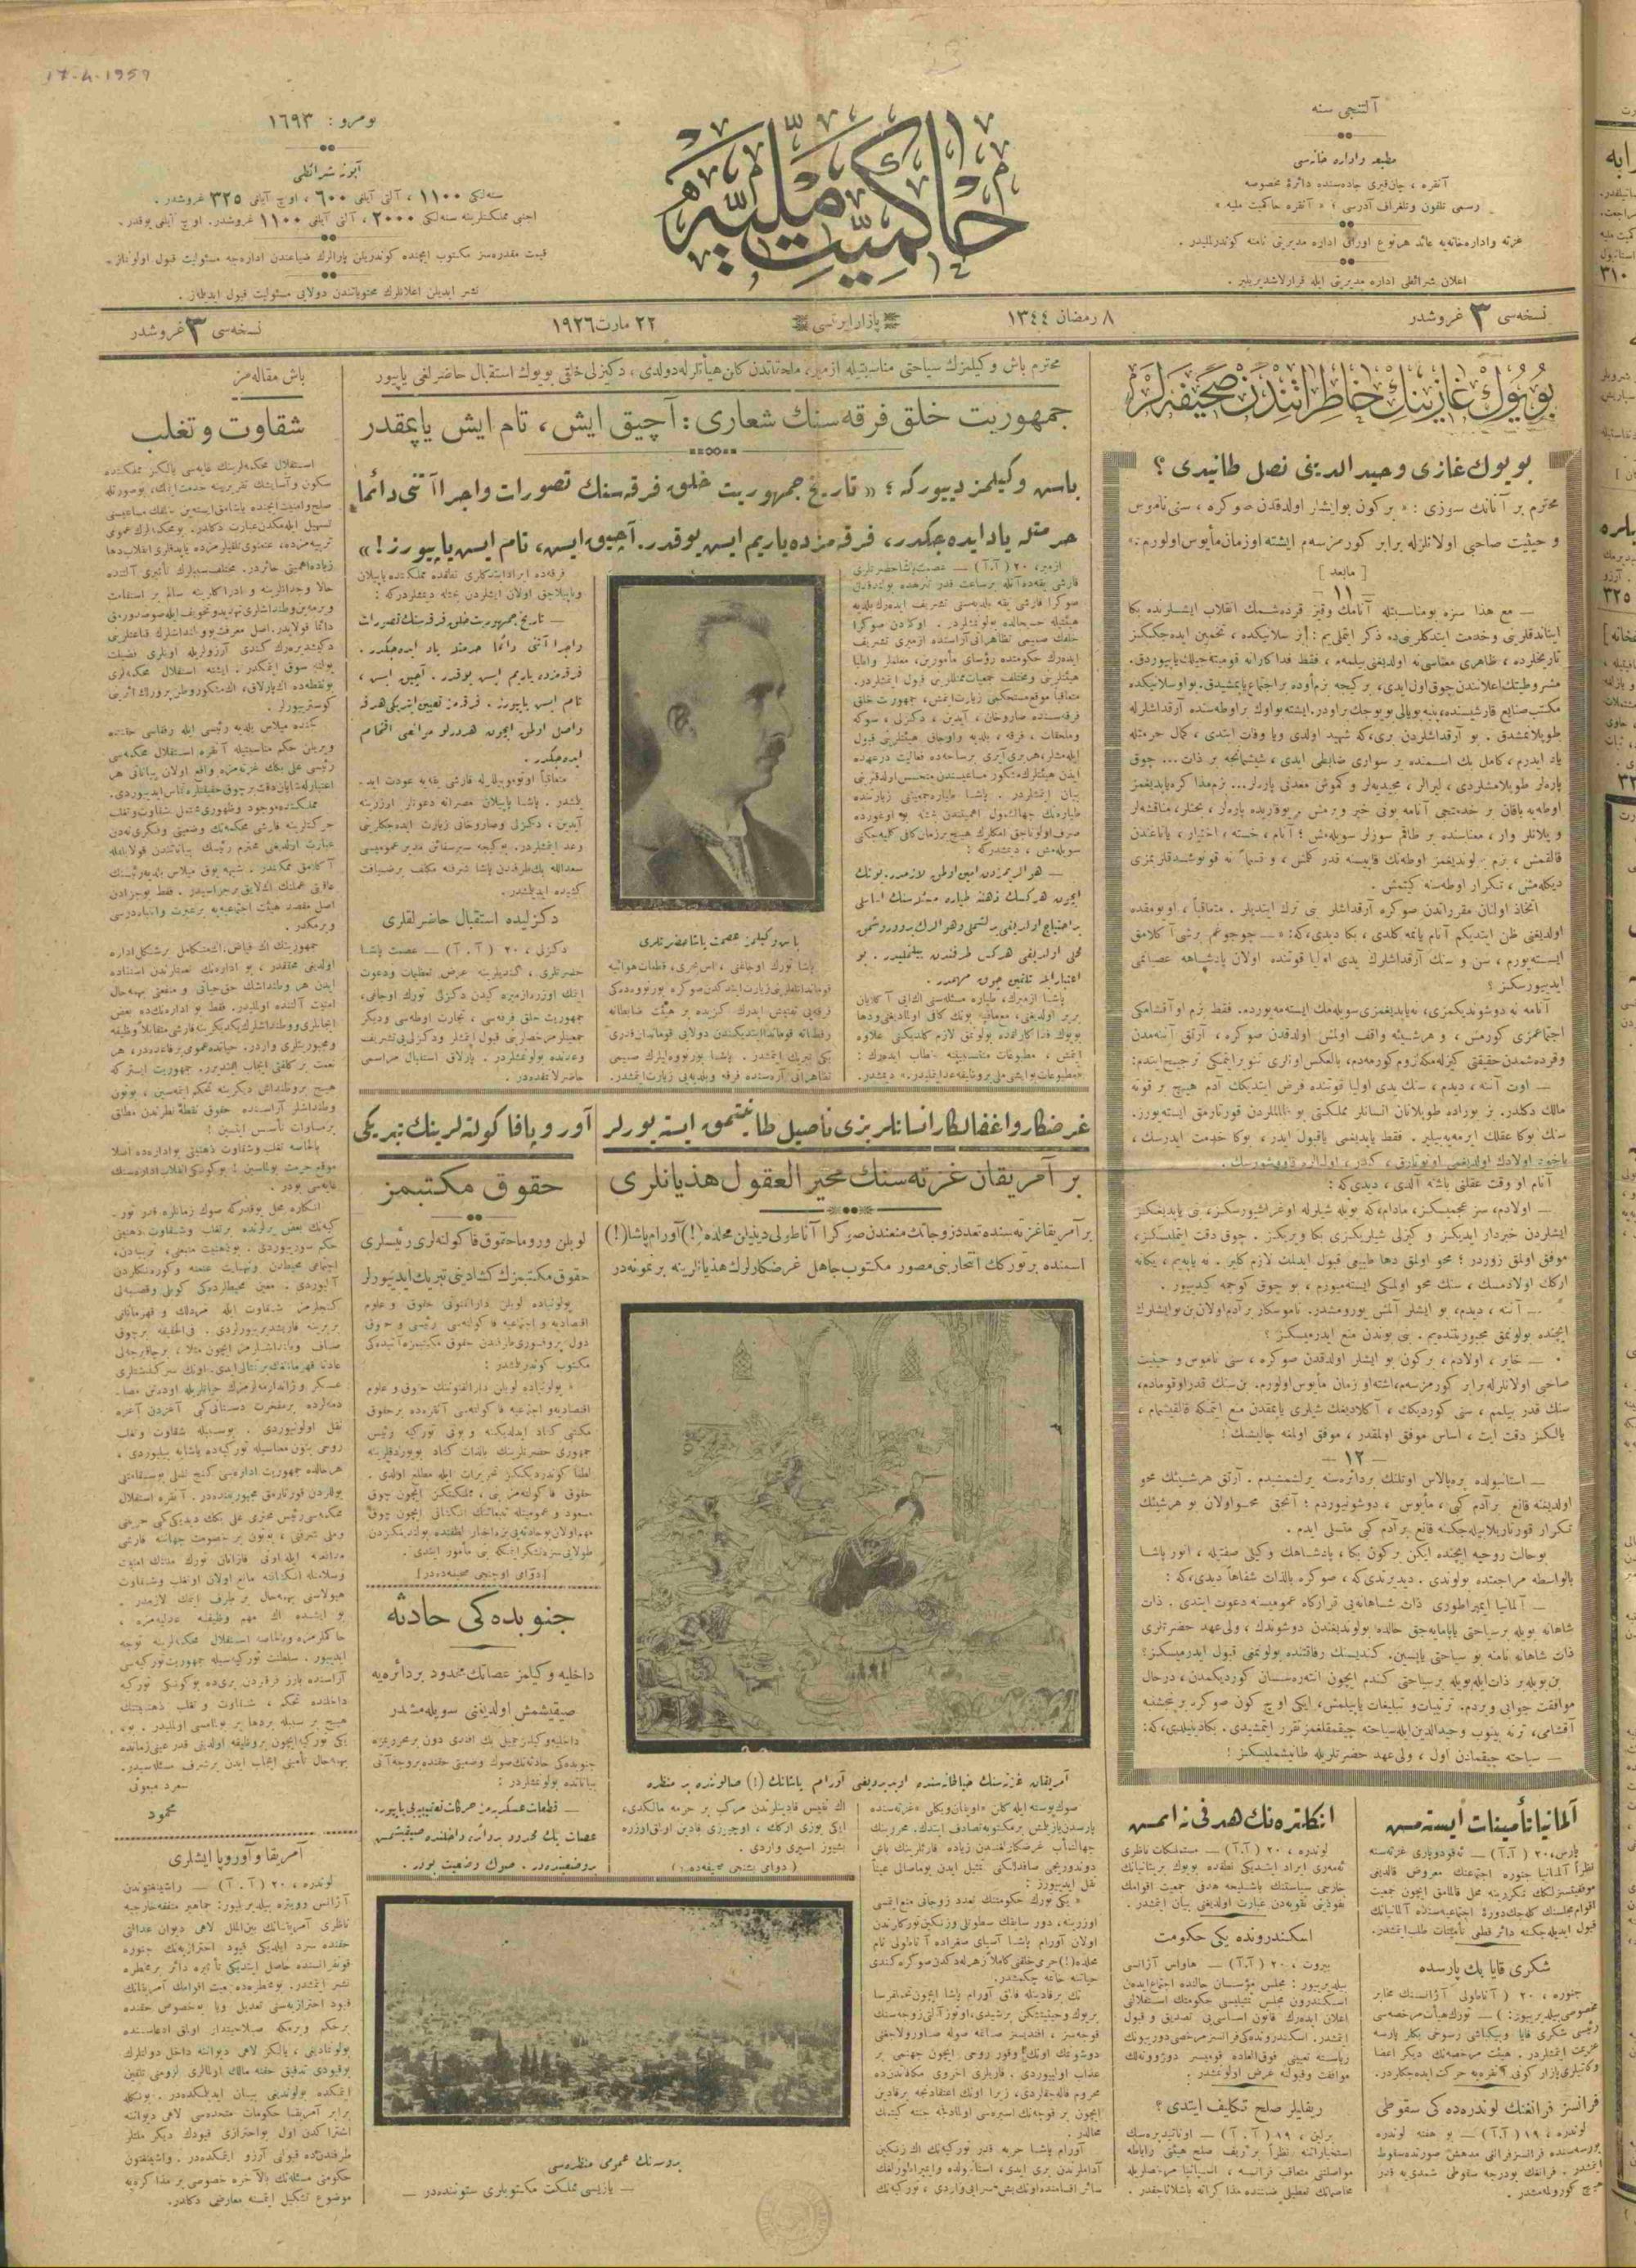 22 Mart 1926 Tarihli Hakimiyet-i Milliye Gazetesi Sayfa 1